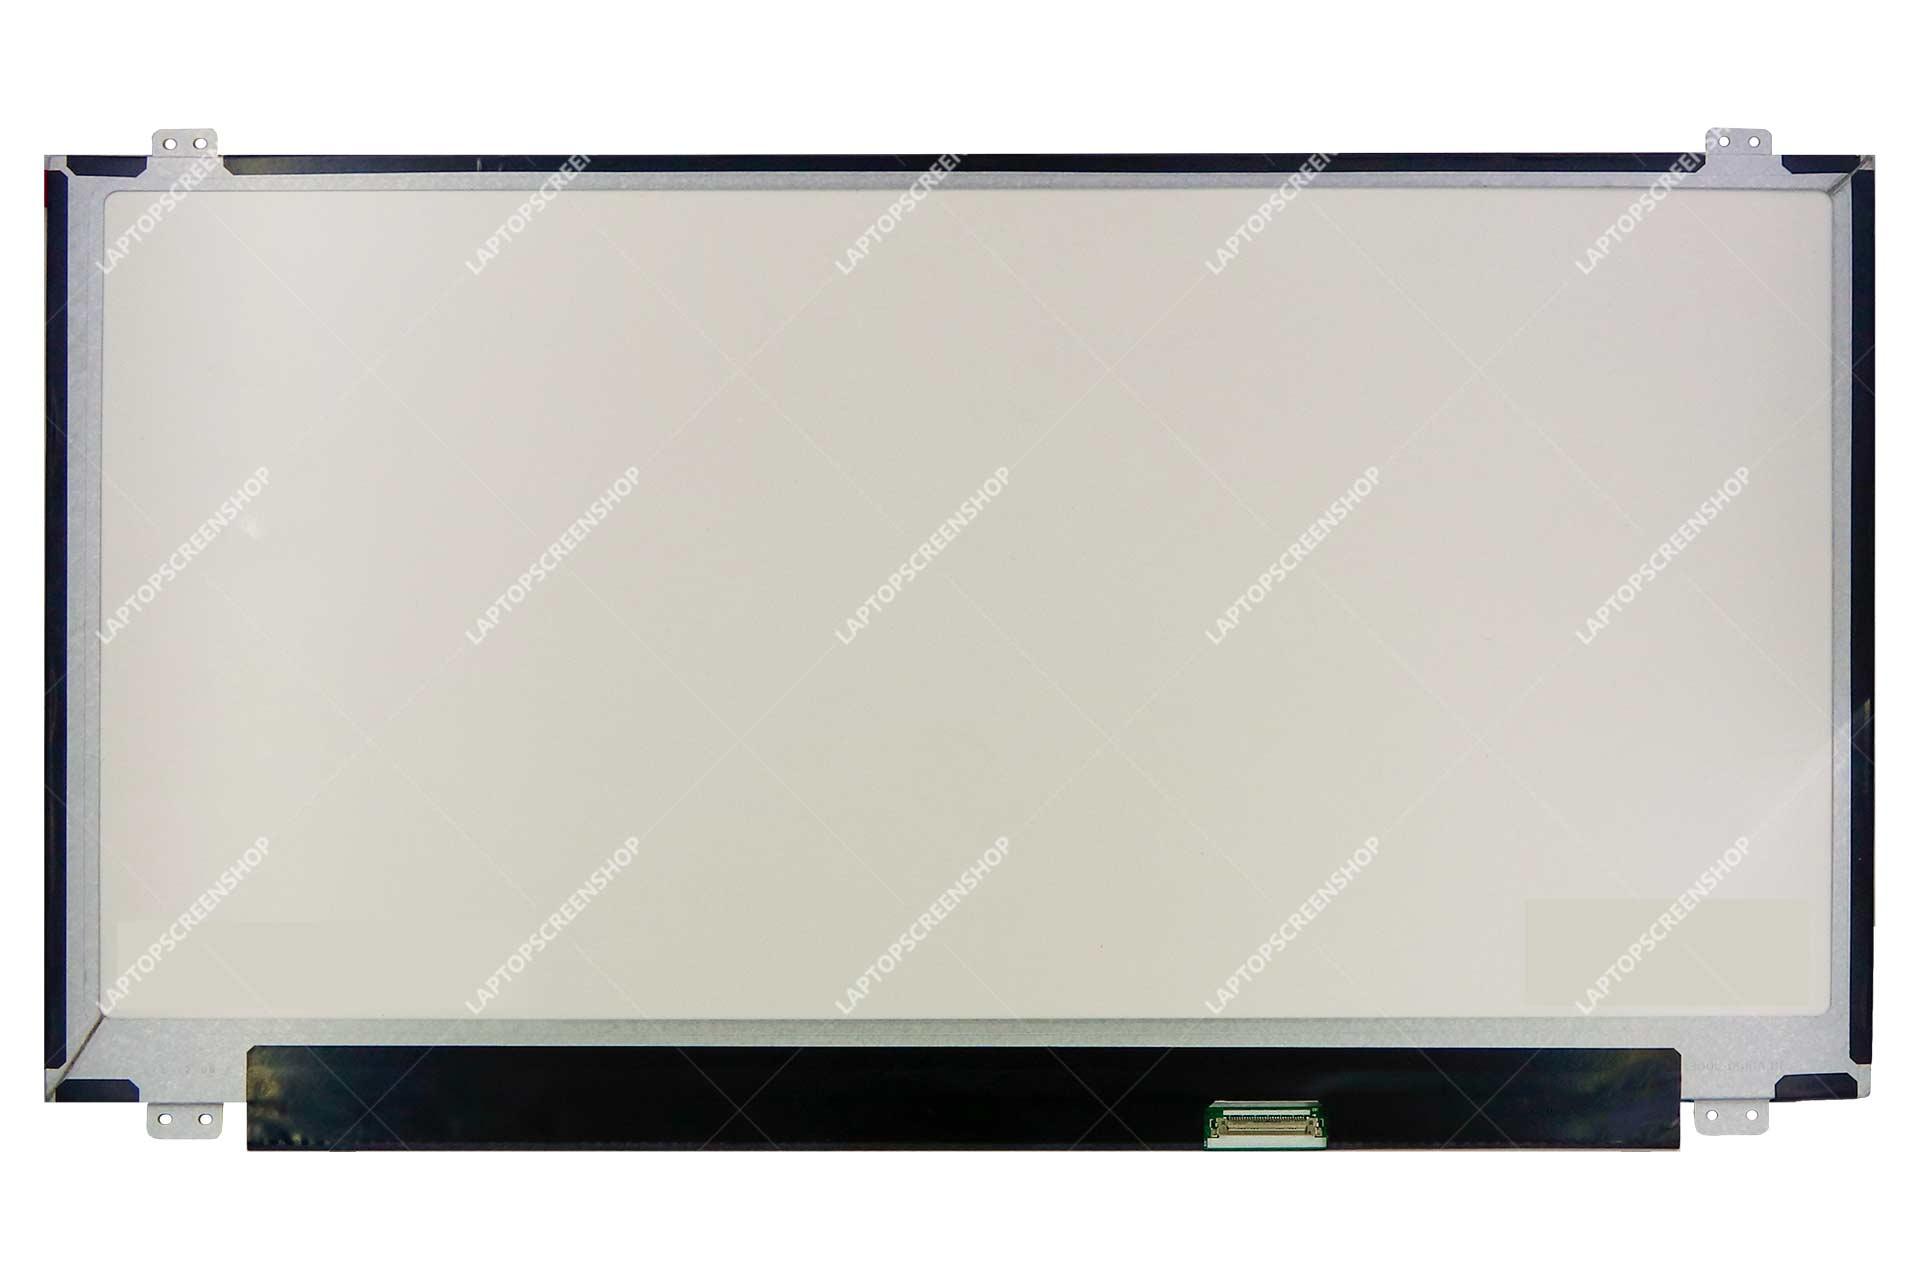 ACER-ASPIRE-E1-510-4413-LCD |HD|فروشگاه لپ تاپ اسکرين | تعمير لپ تاپ